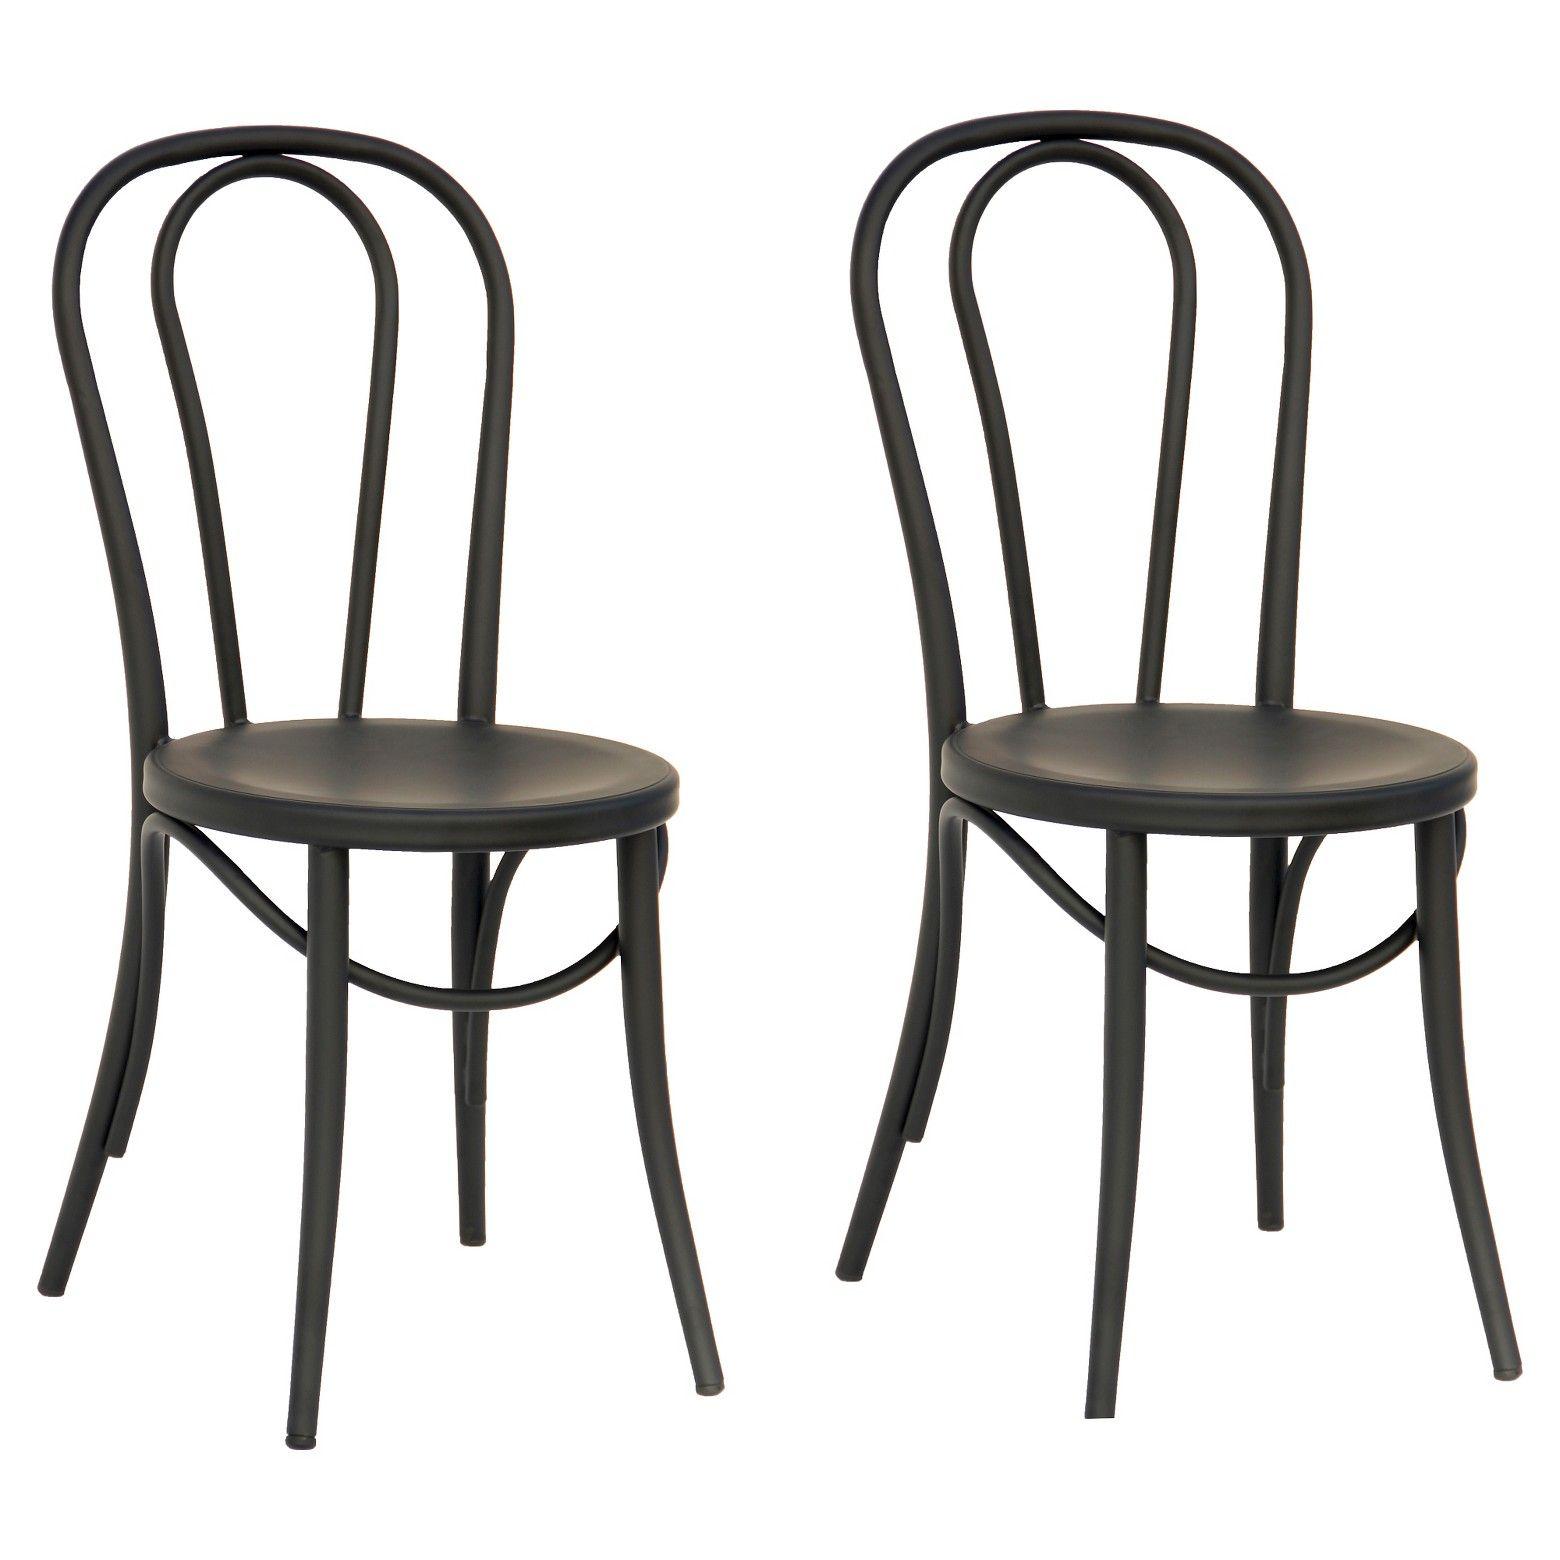 Set Of 2 Emery Metal Bistro Chair Threshold Kodin Sisustus